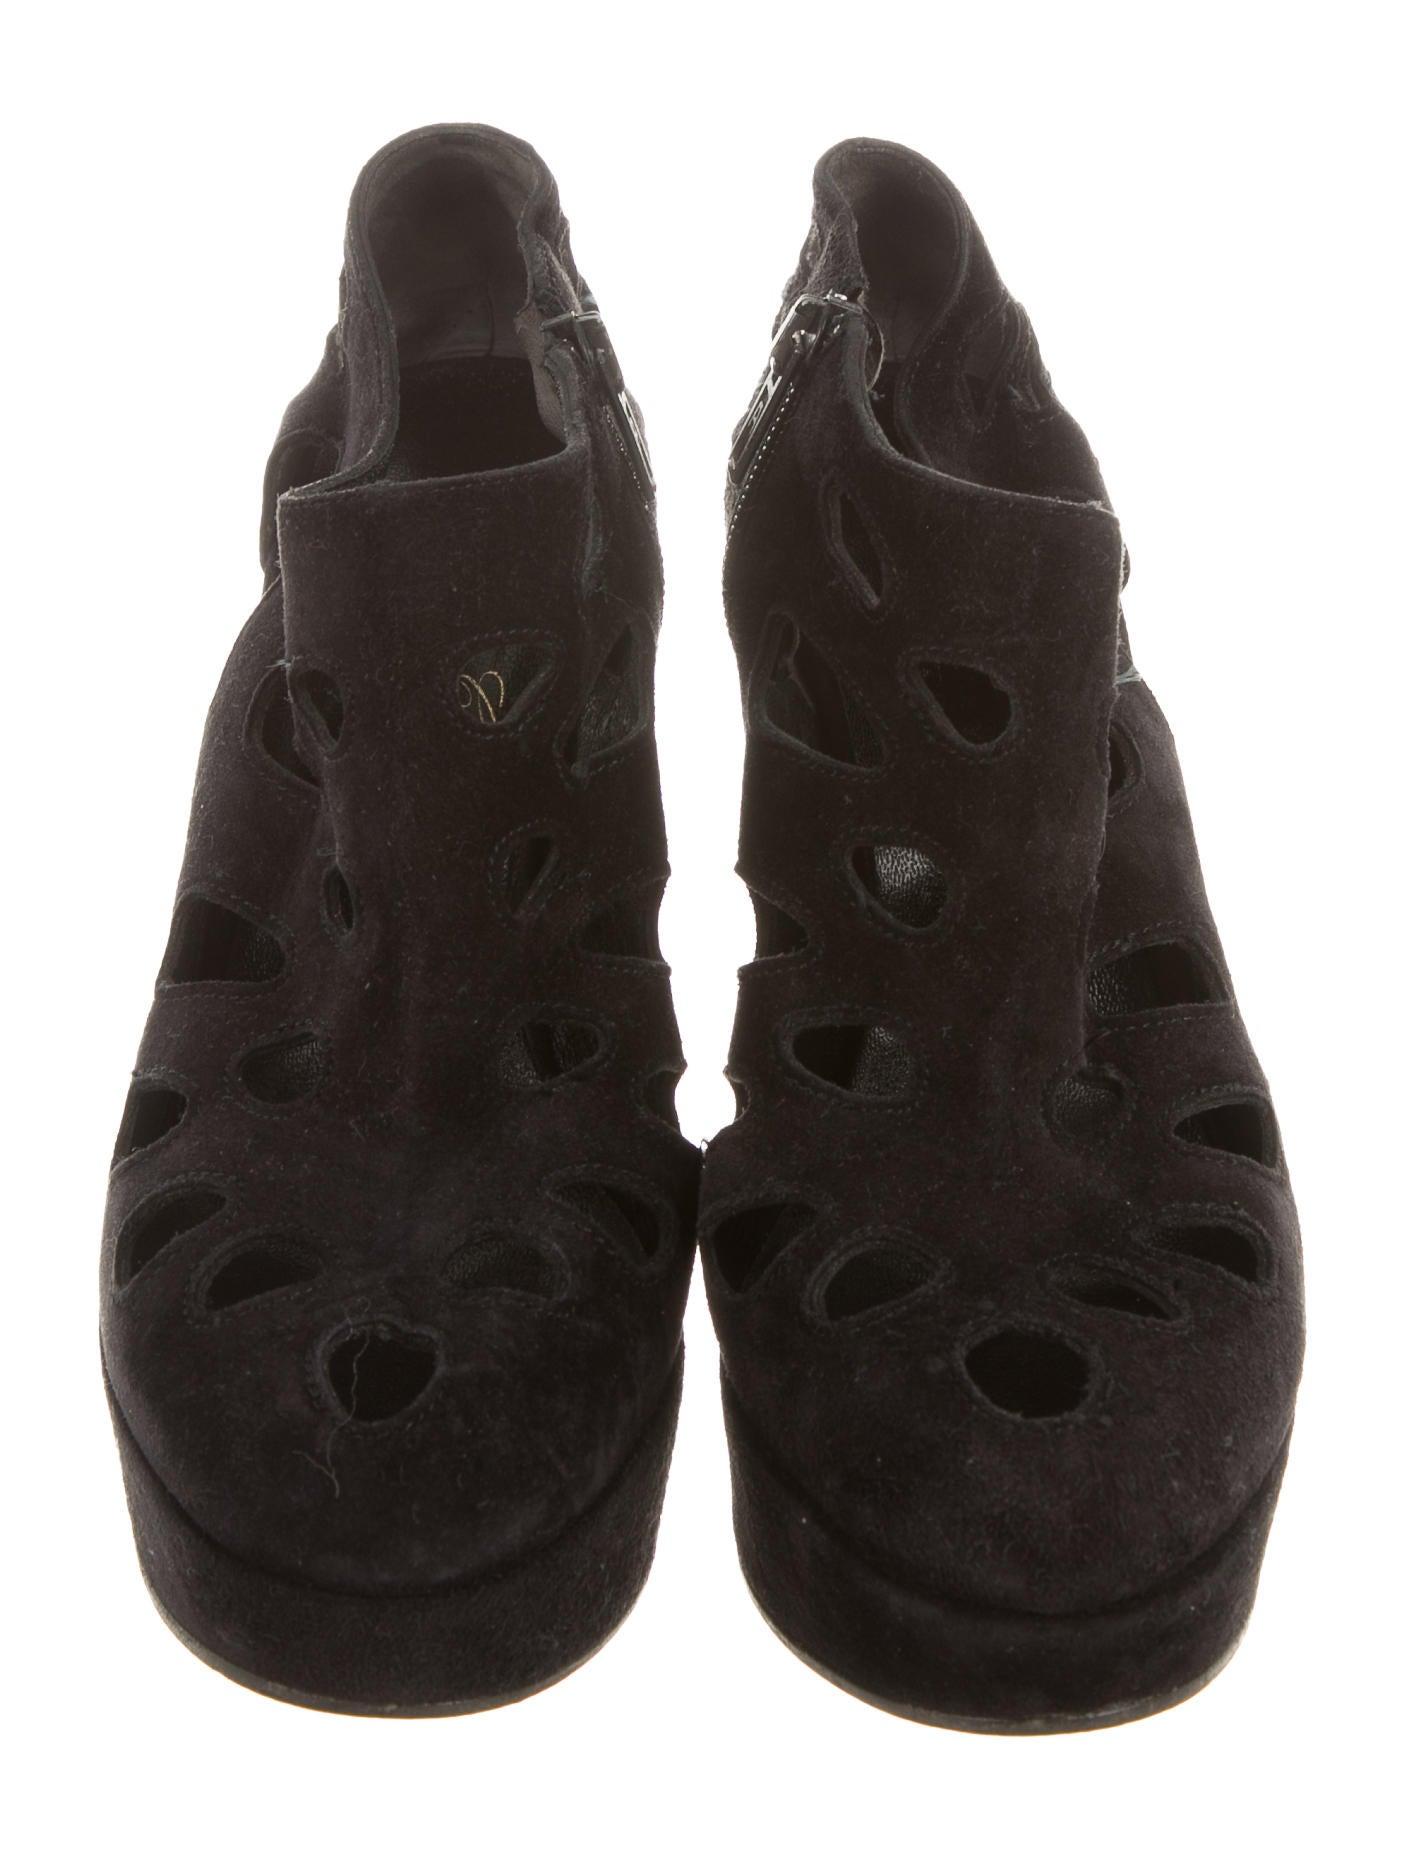 robert clergerie suede platform booties shoes rog23830